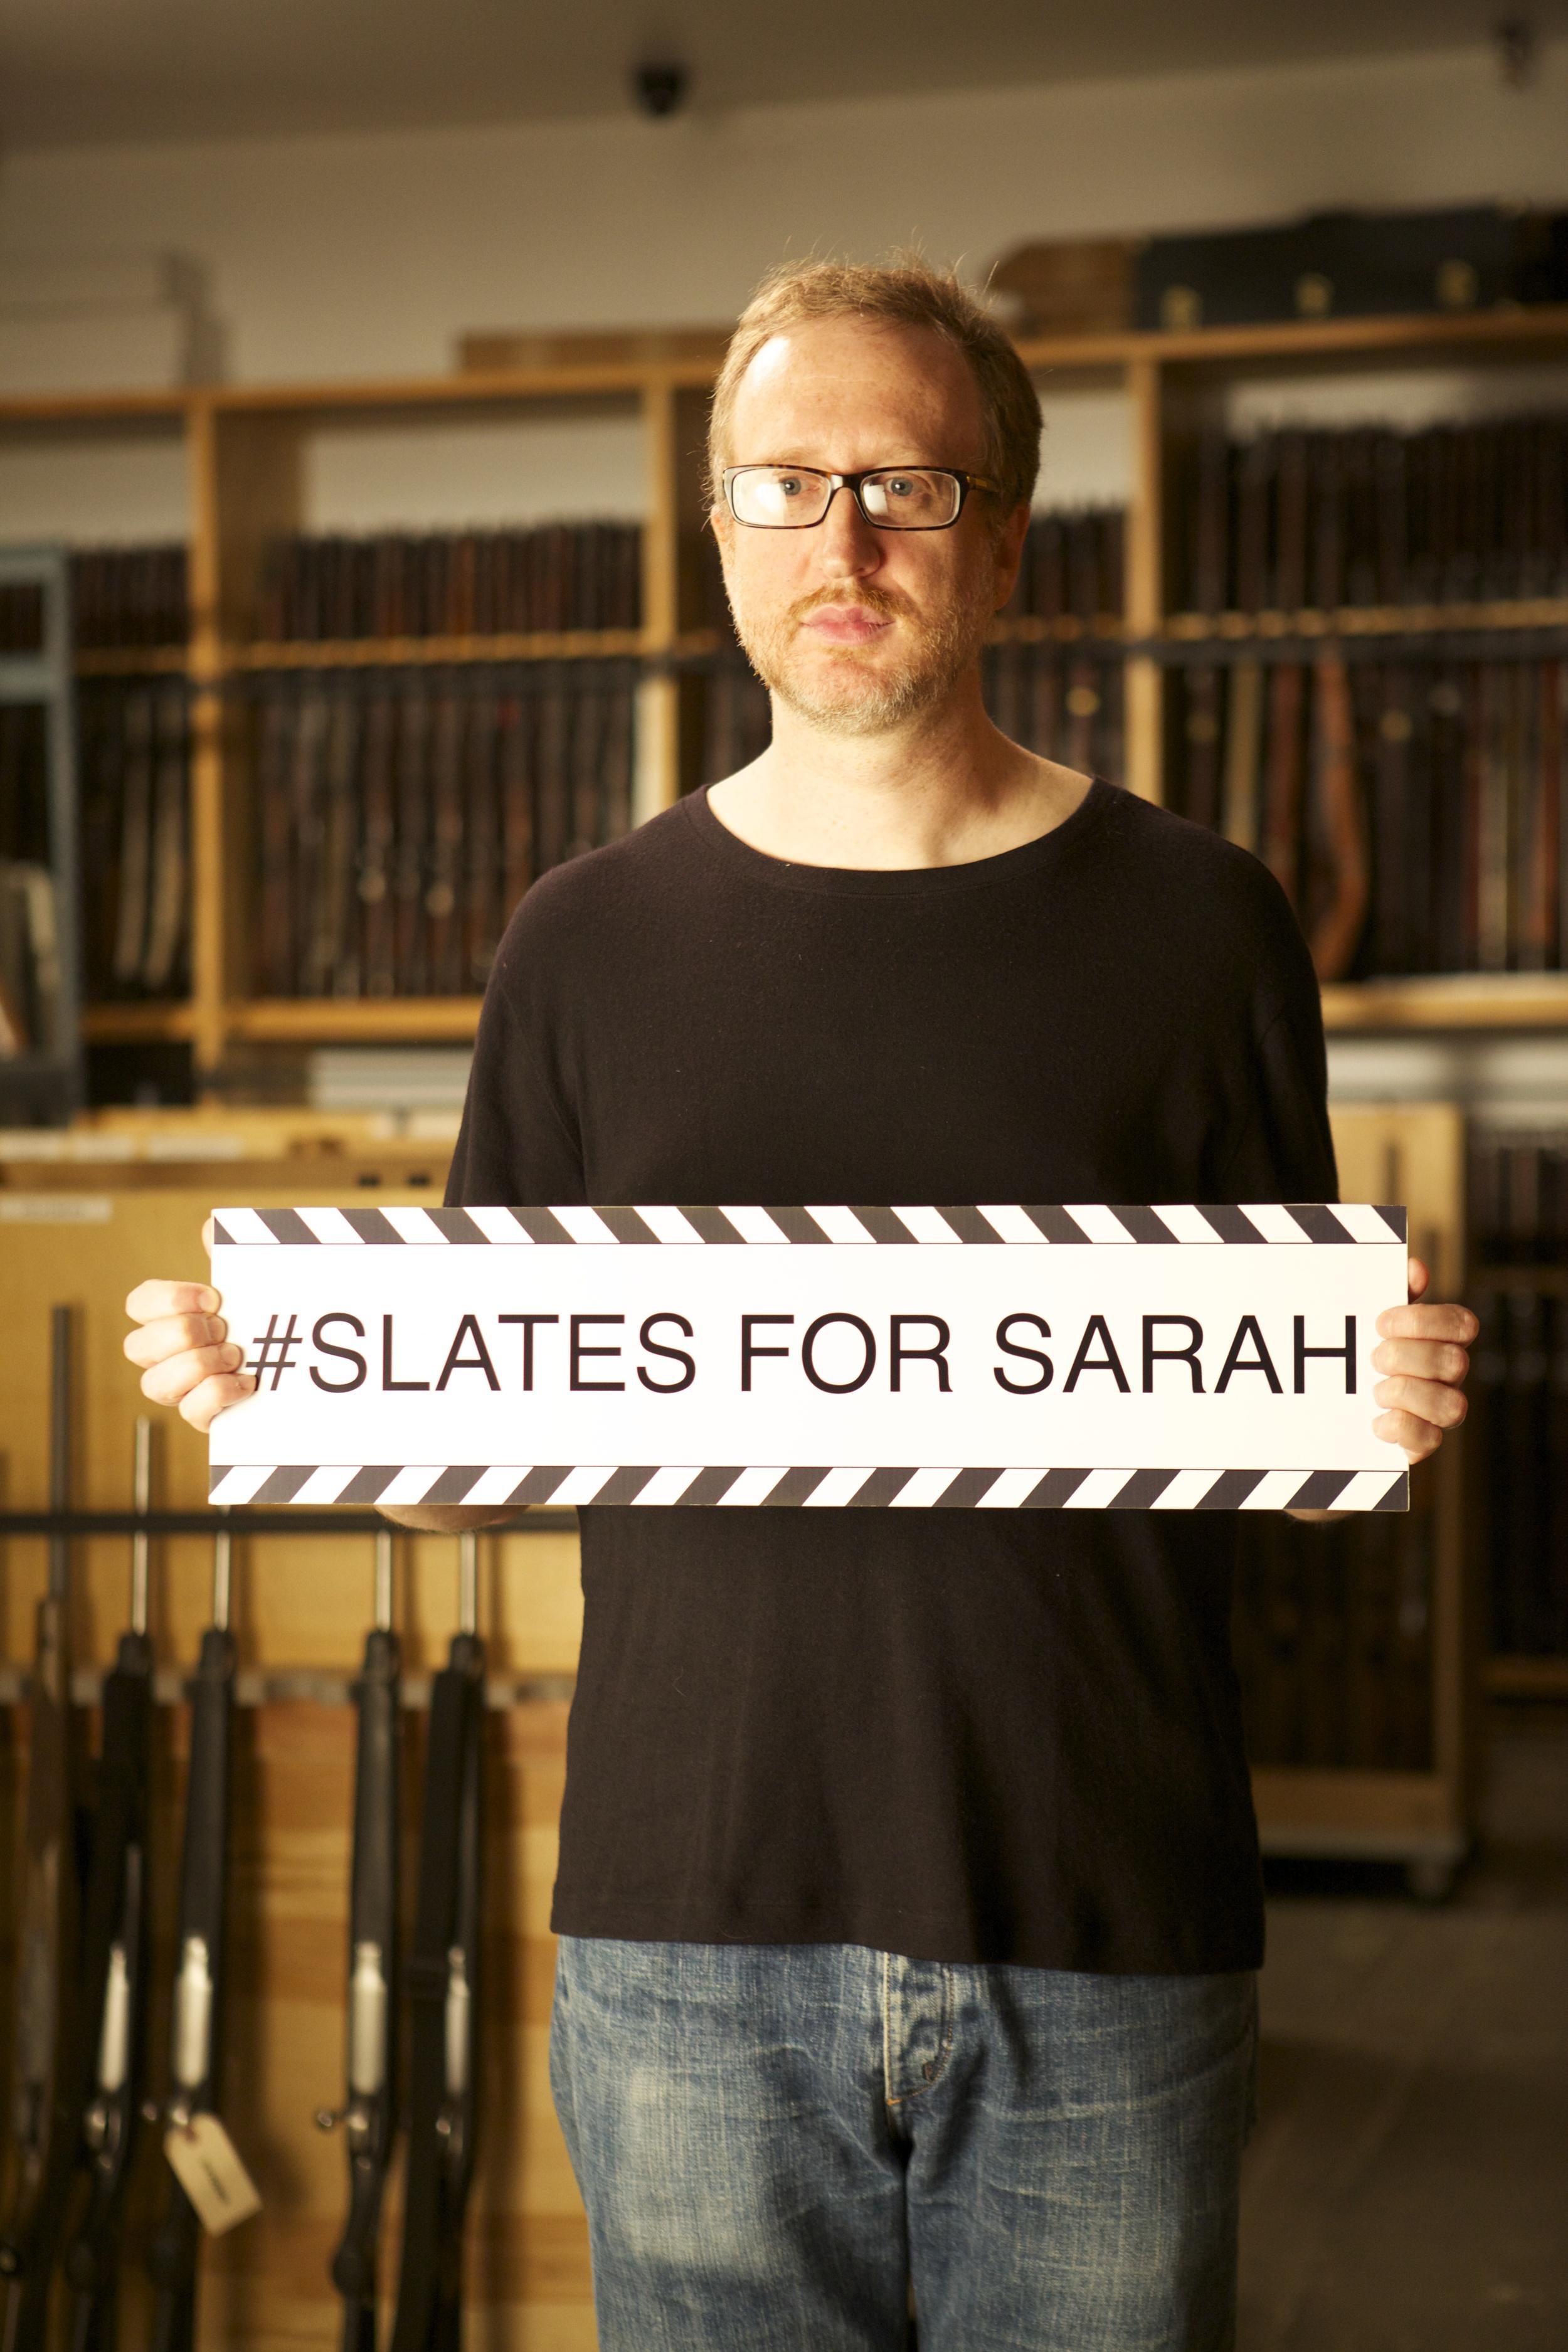 Slates for Sarah